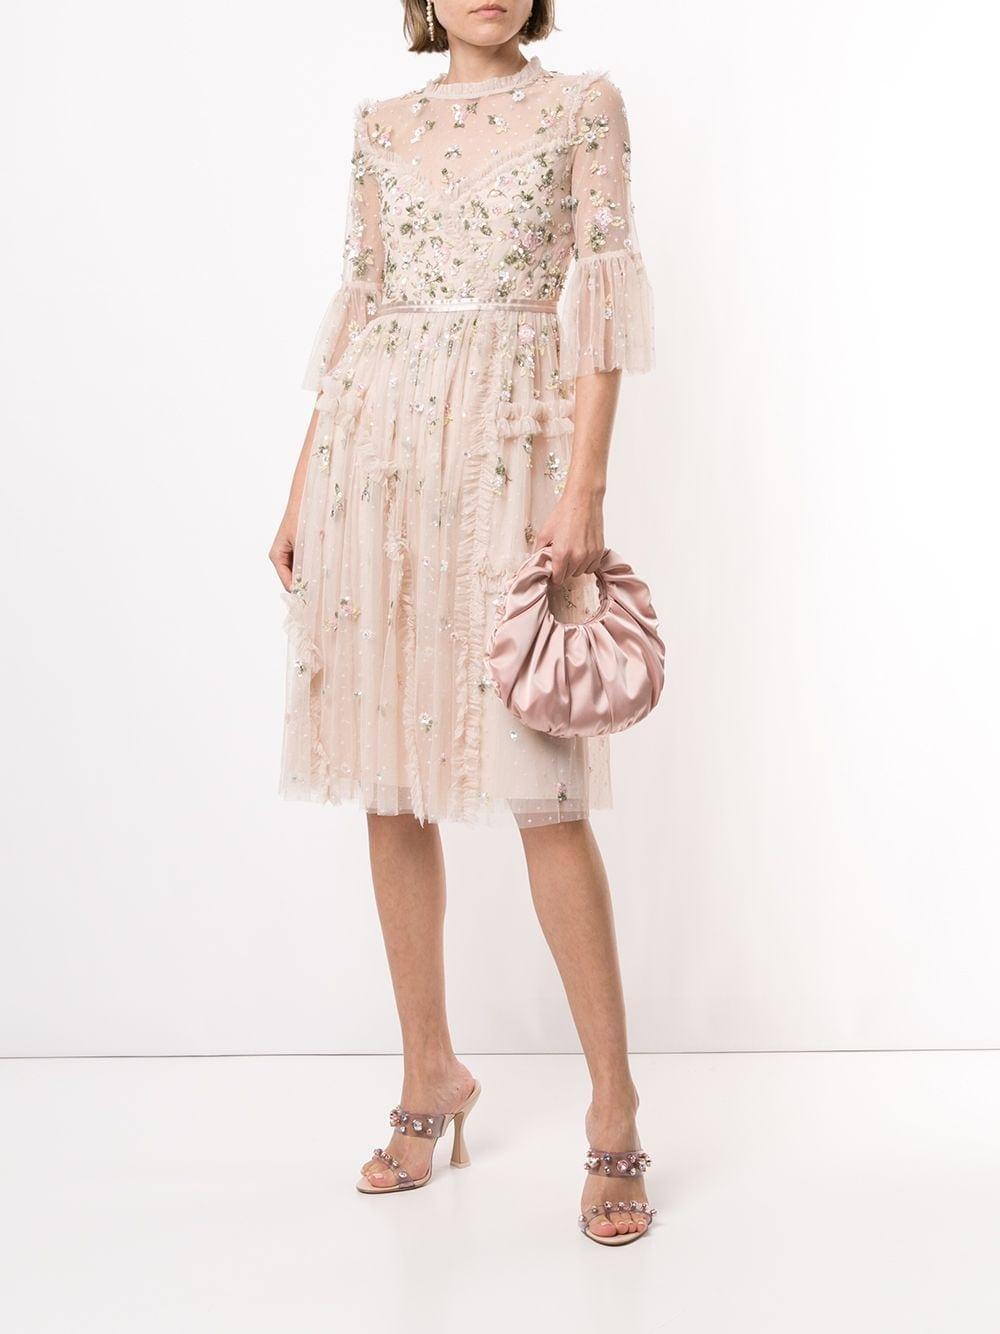 NEEDLE & THREAD Sequin-flower Appliqués Tulle Dress